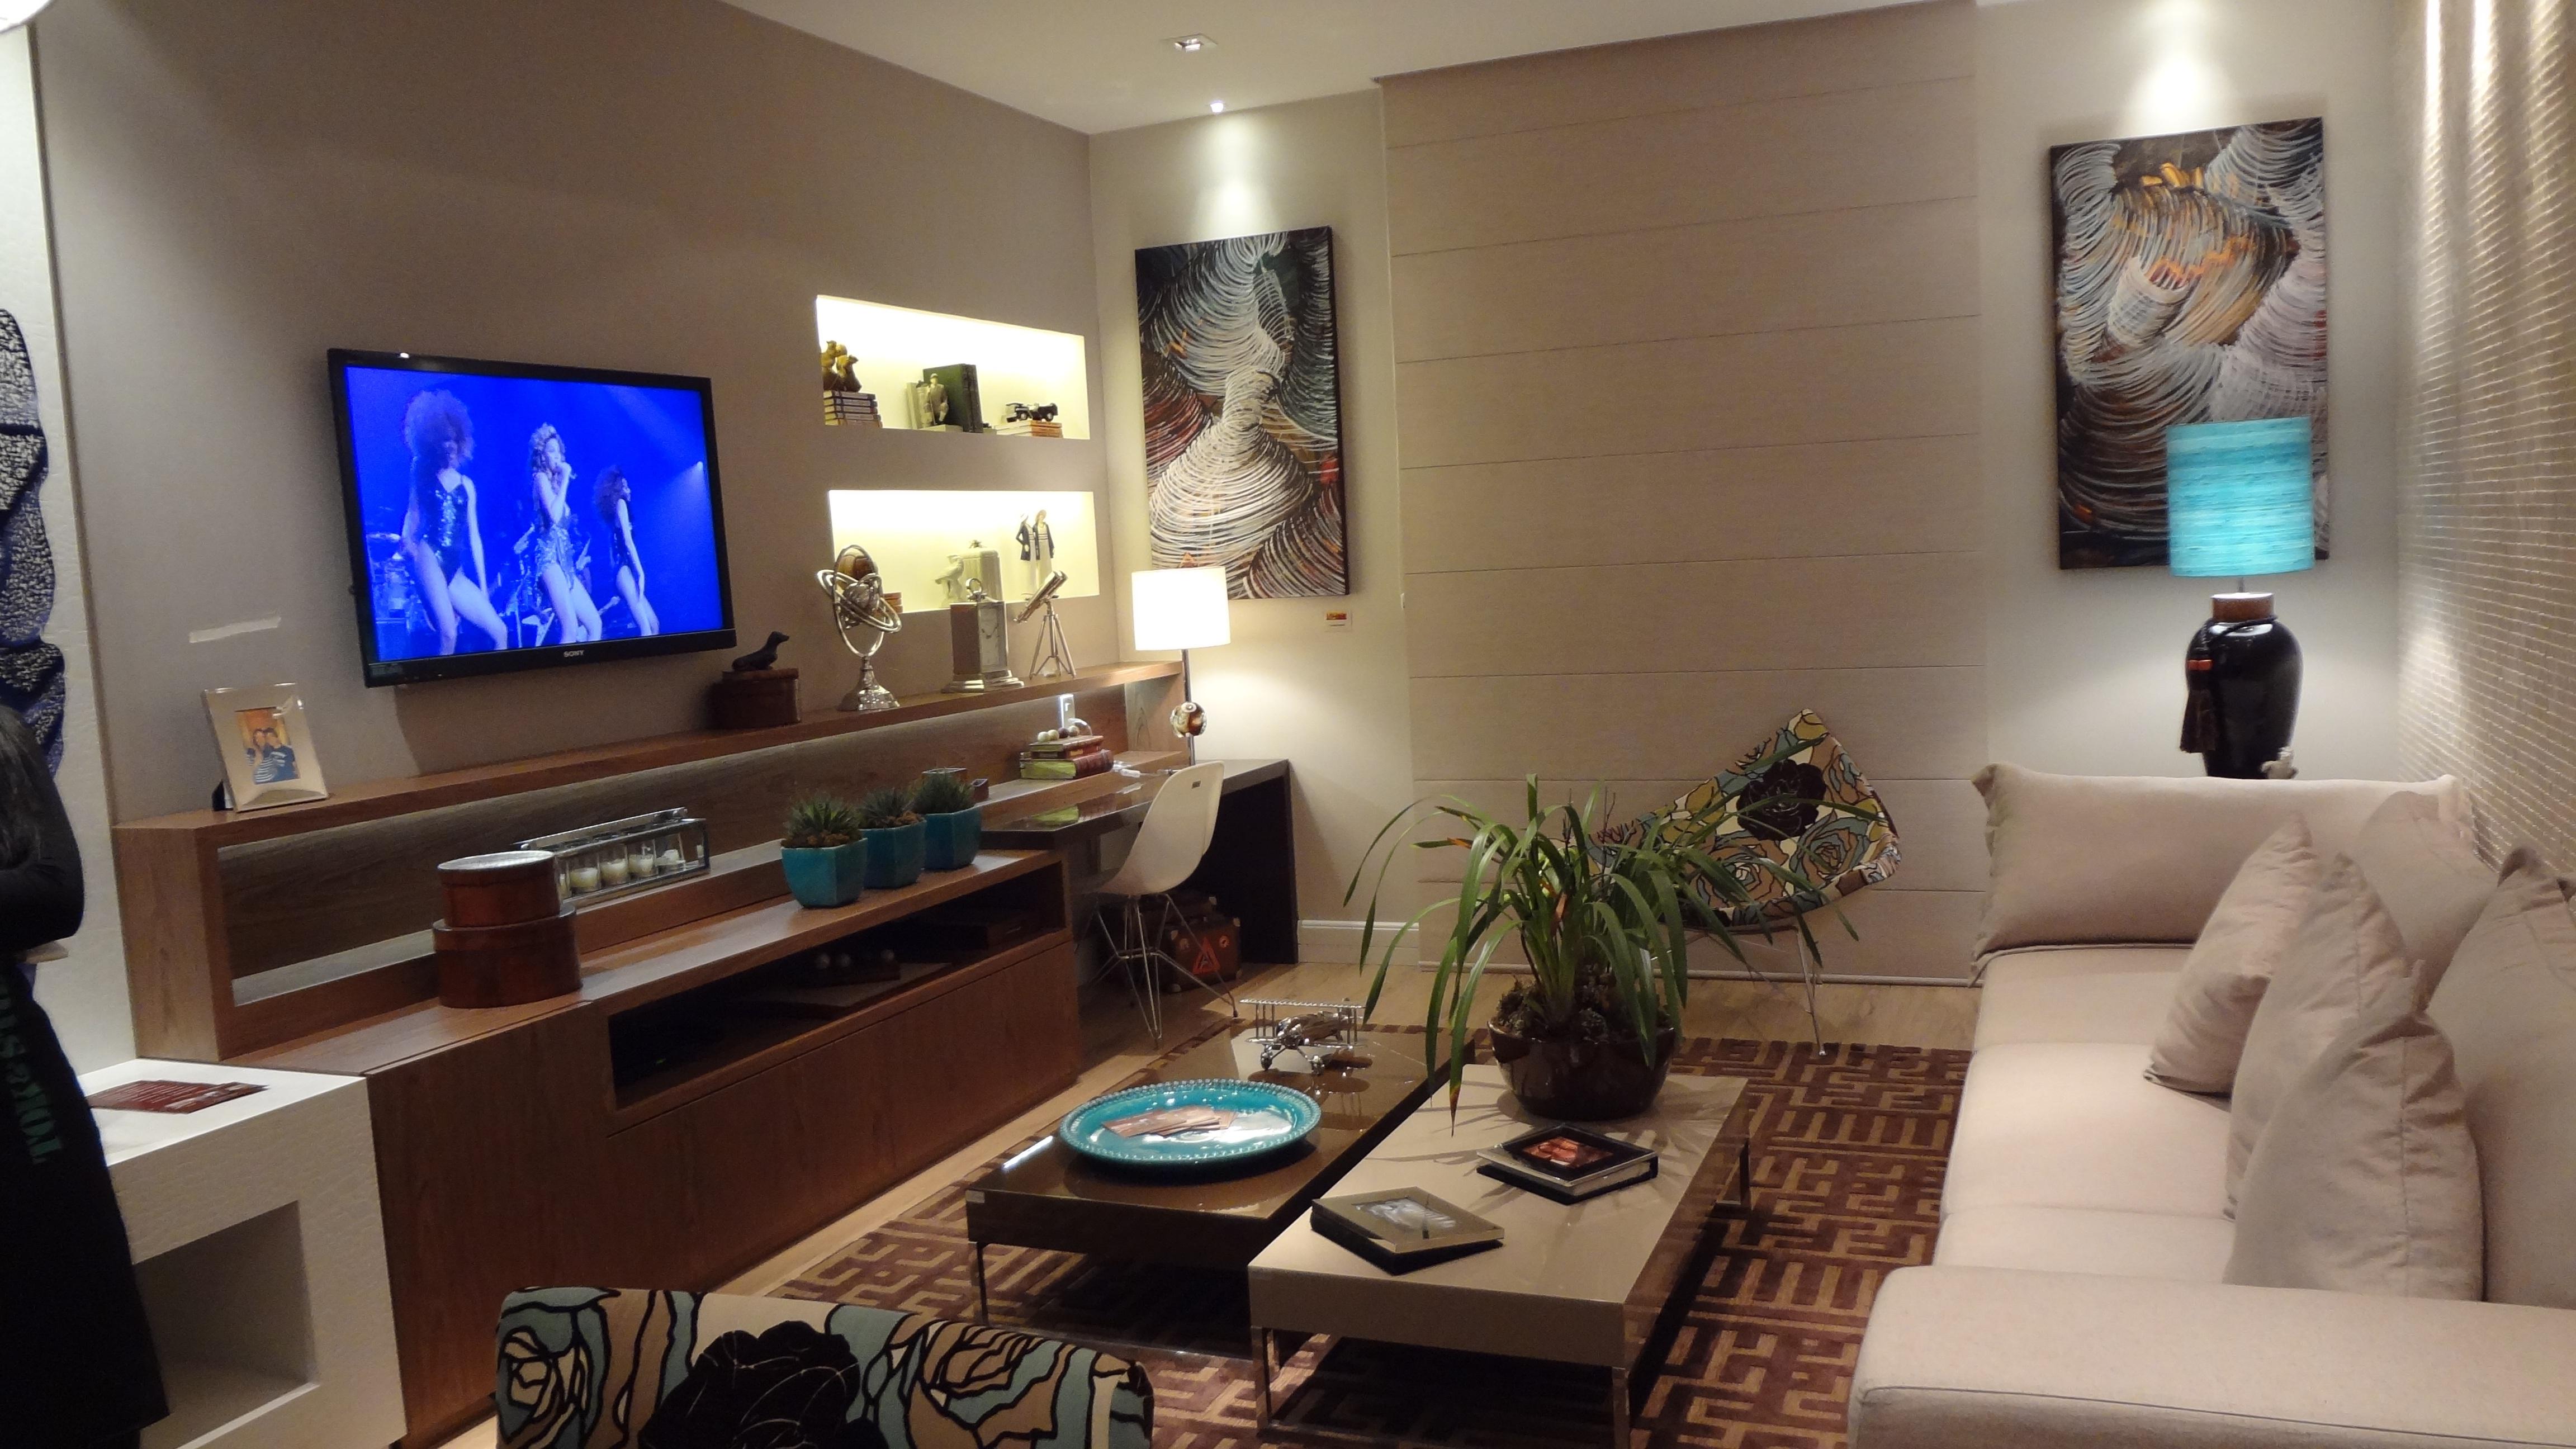 free stock photo of decoration sofa tv. Black Bedroom Furniture Sets. Home Design Ideas